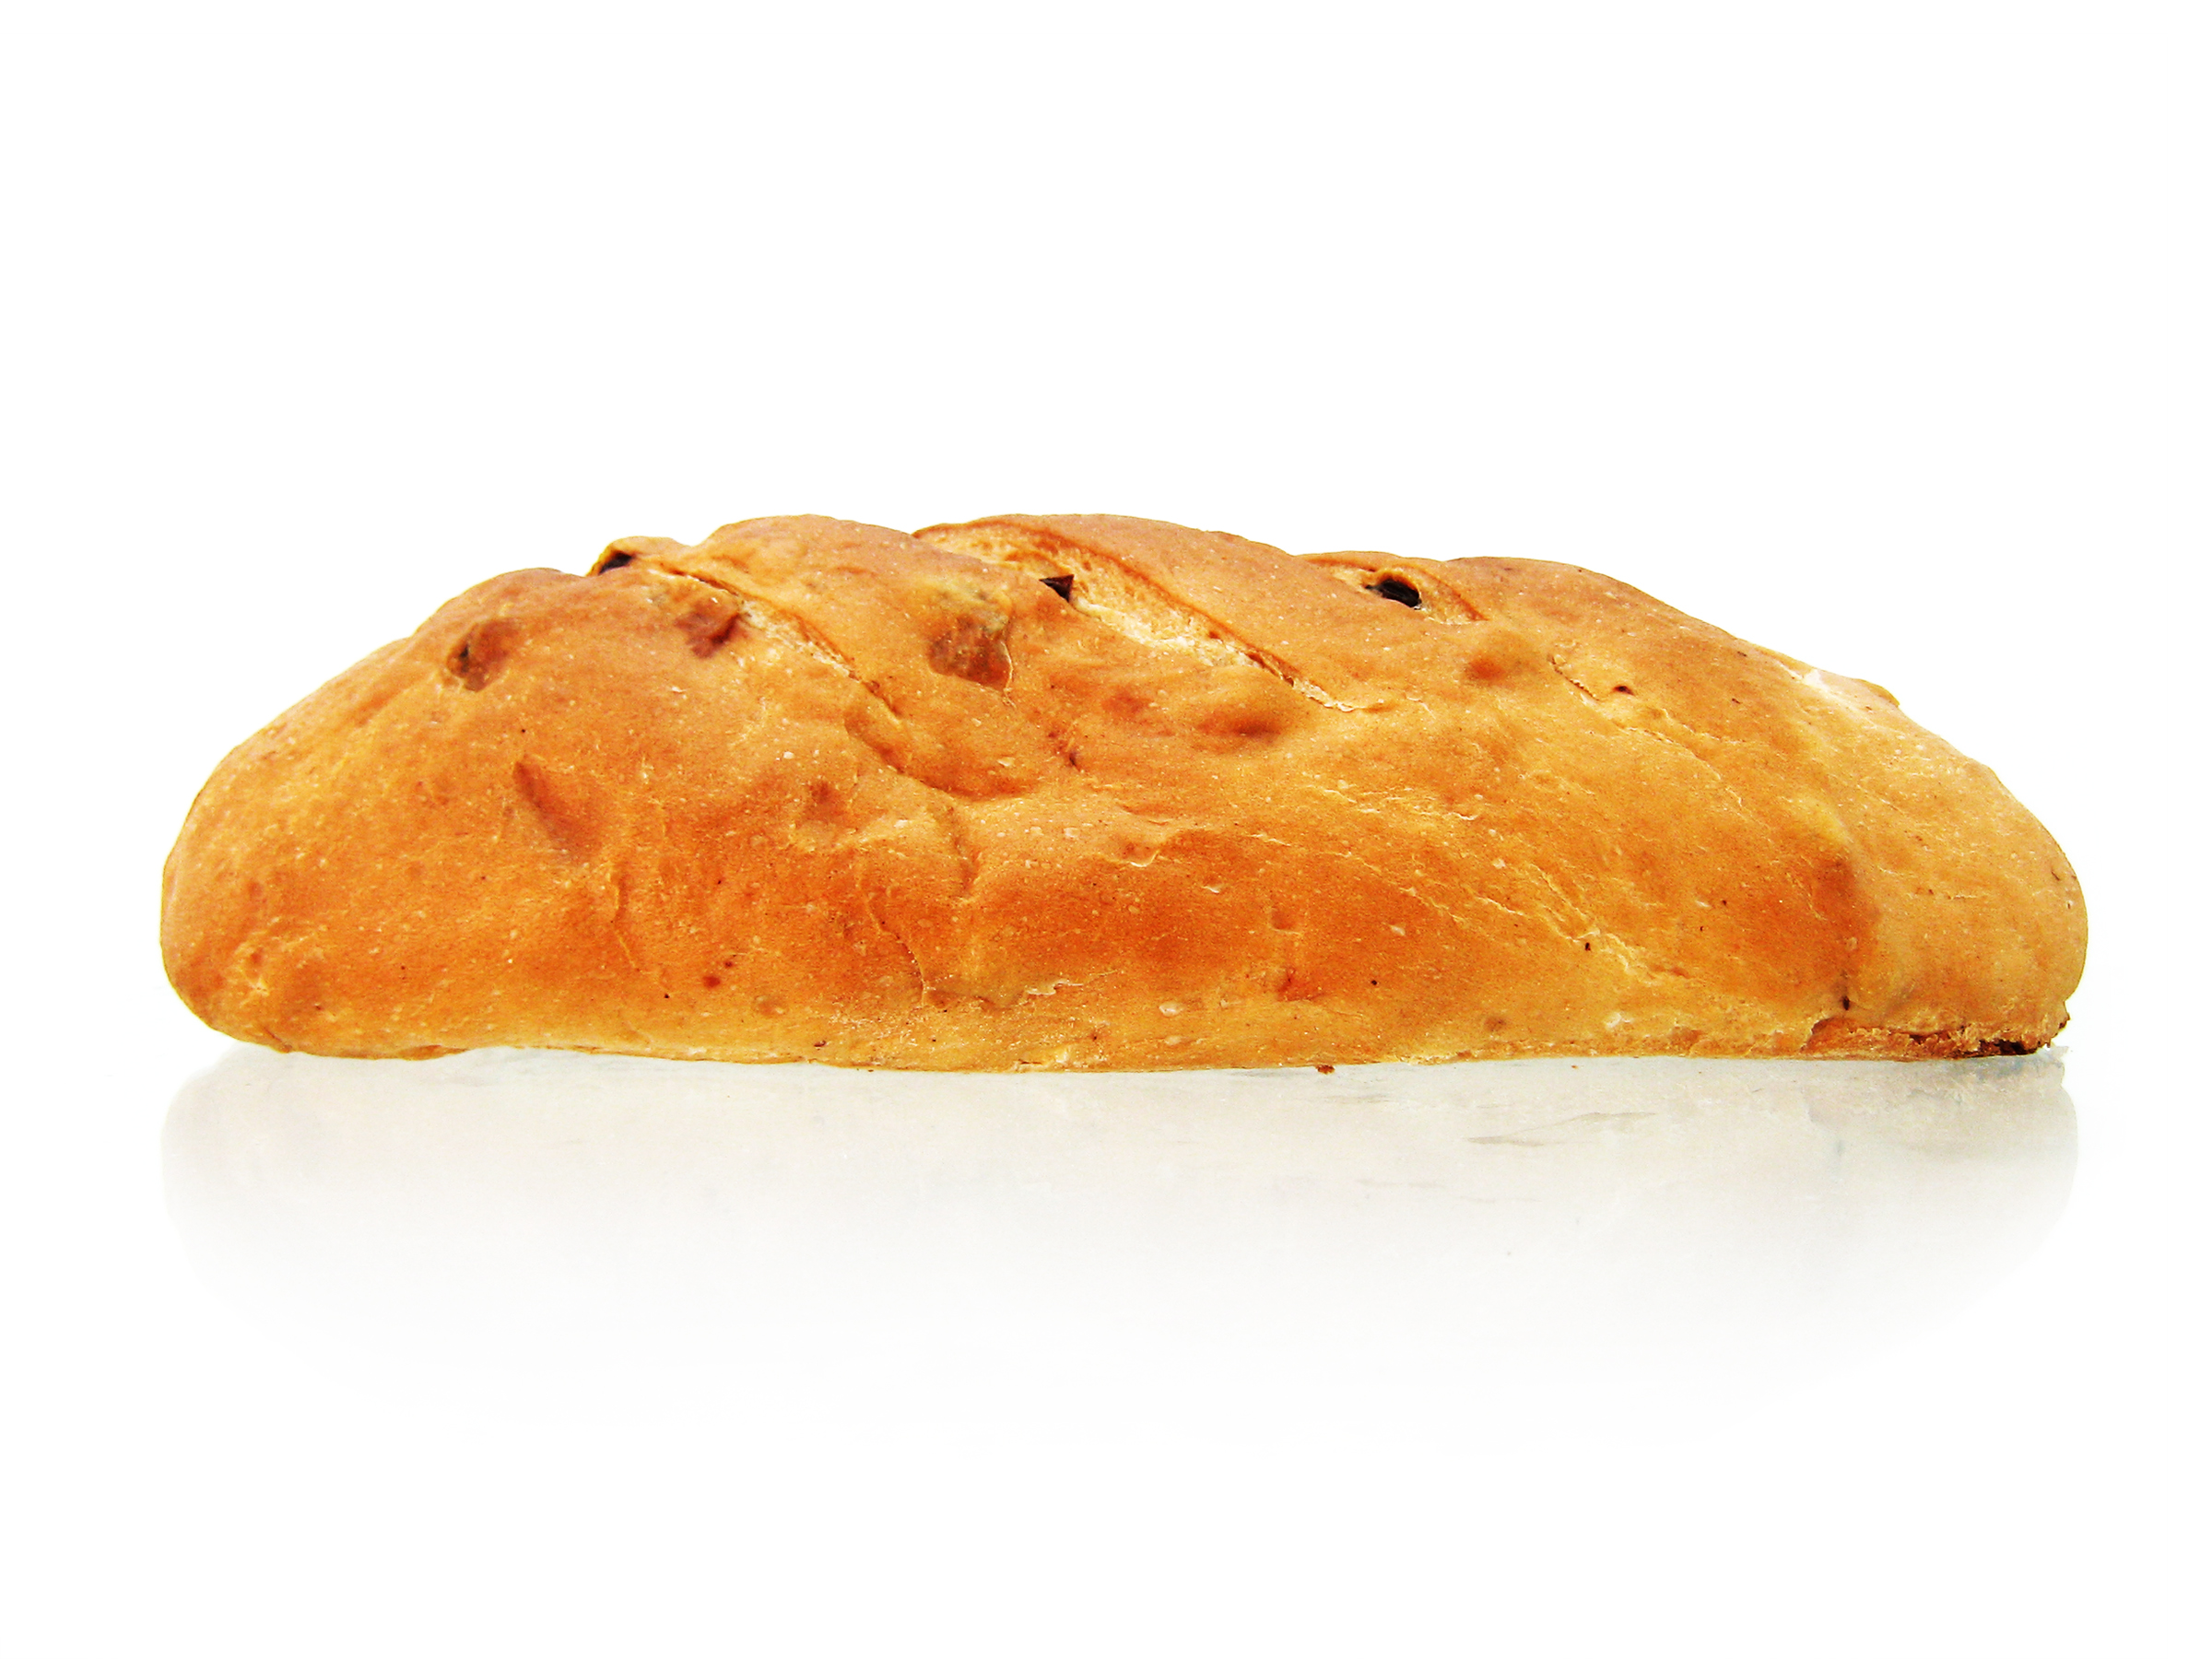 Bread, Bakery, Breakfast, Food, Isolated, HQ Photo